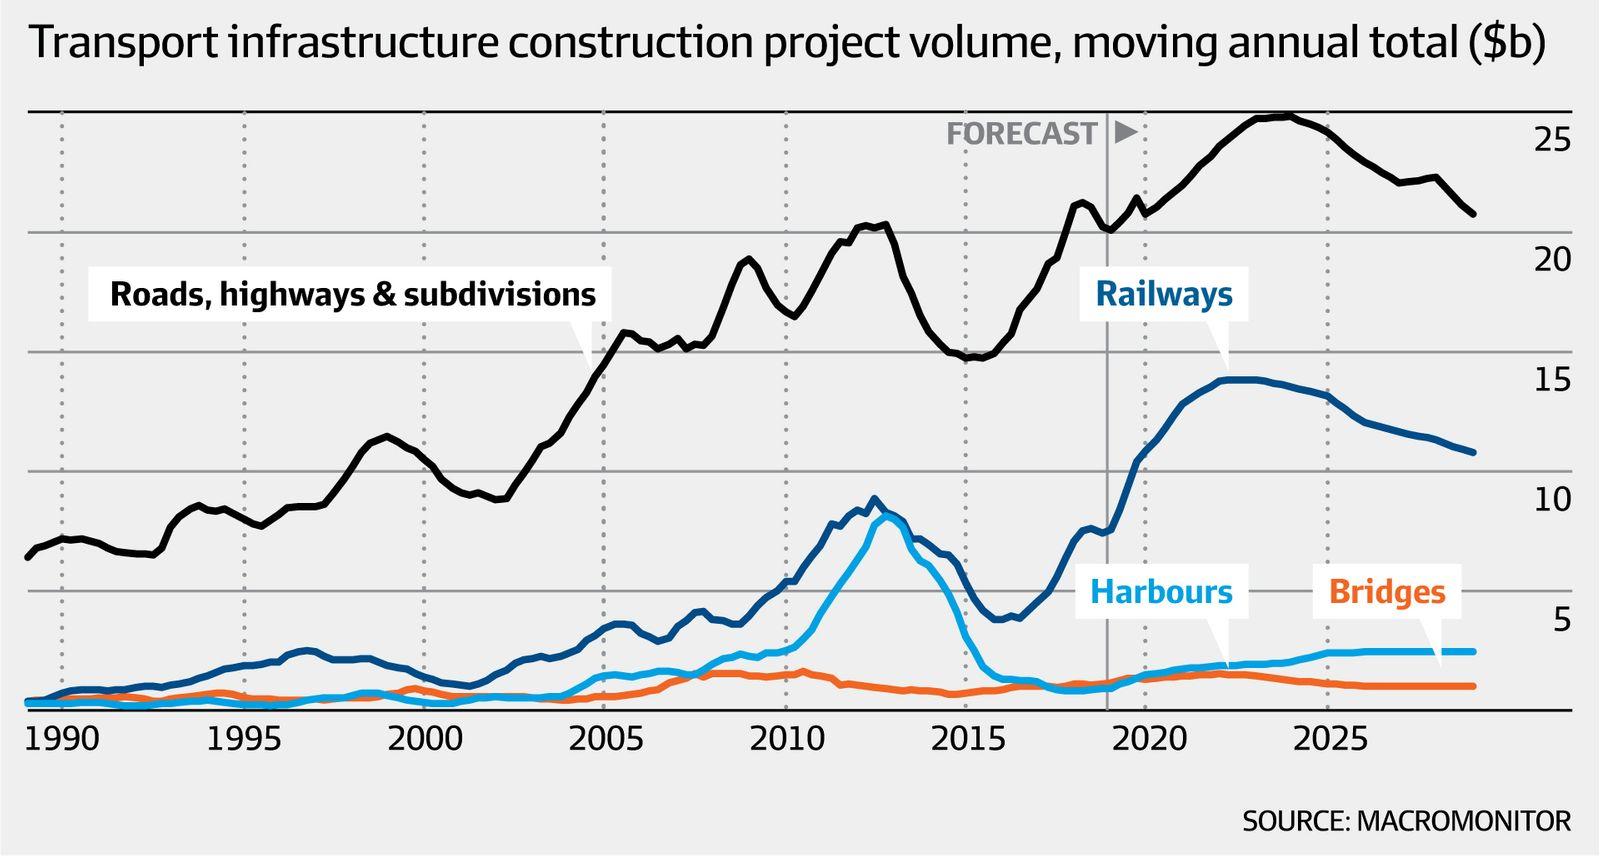 Transport infrastructure construction project volume, moving average total (MacroMonitor, AFR)